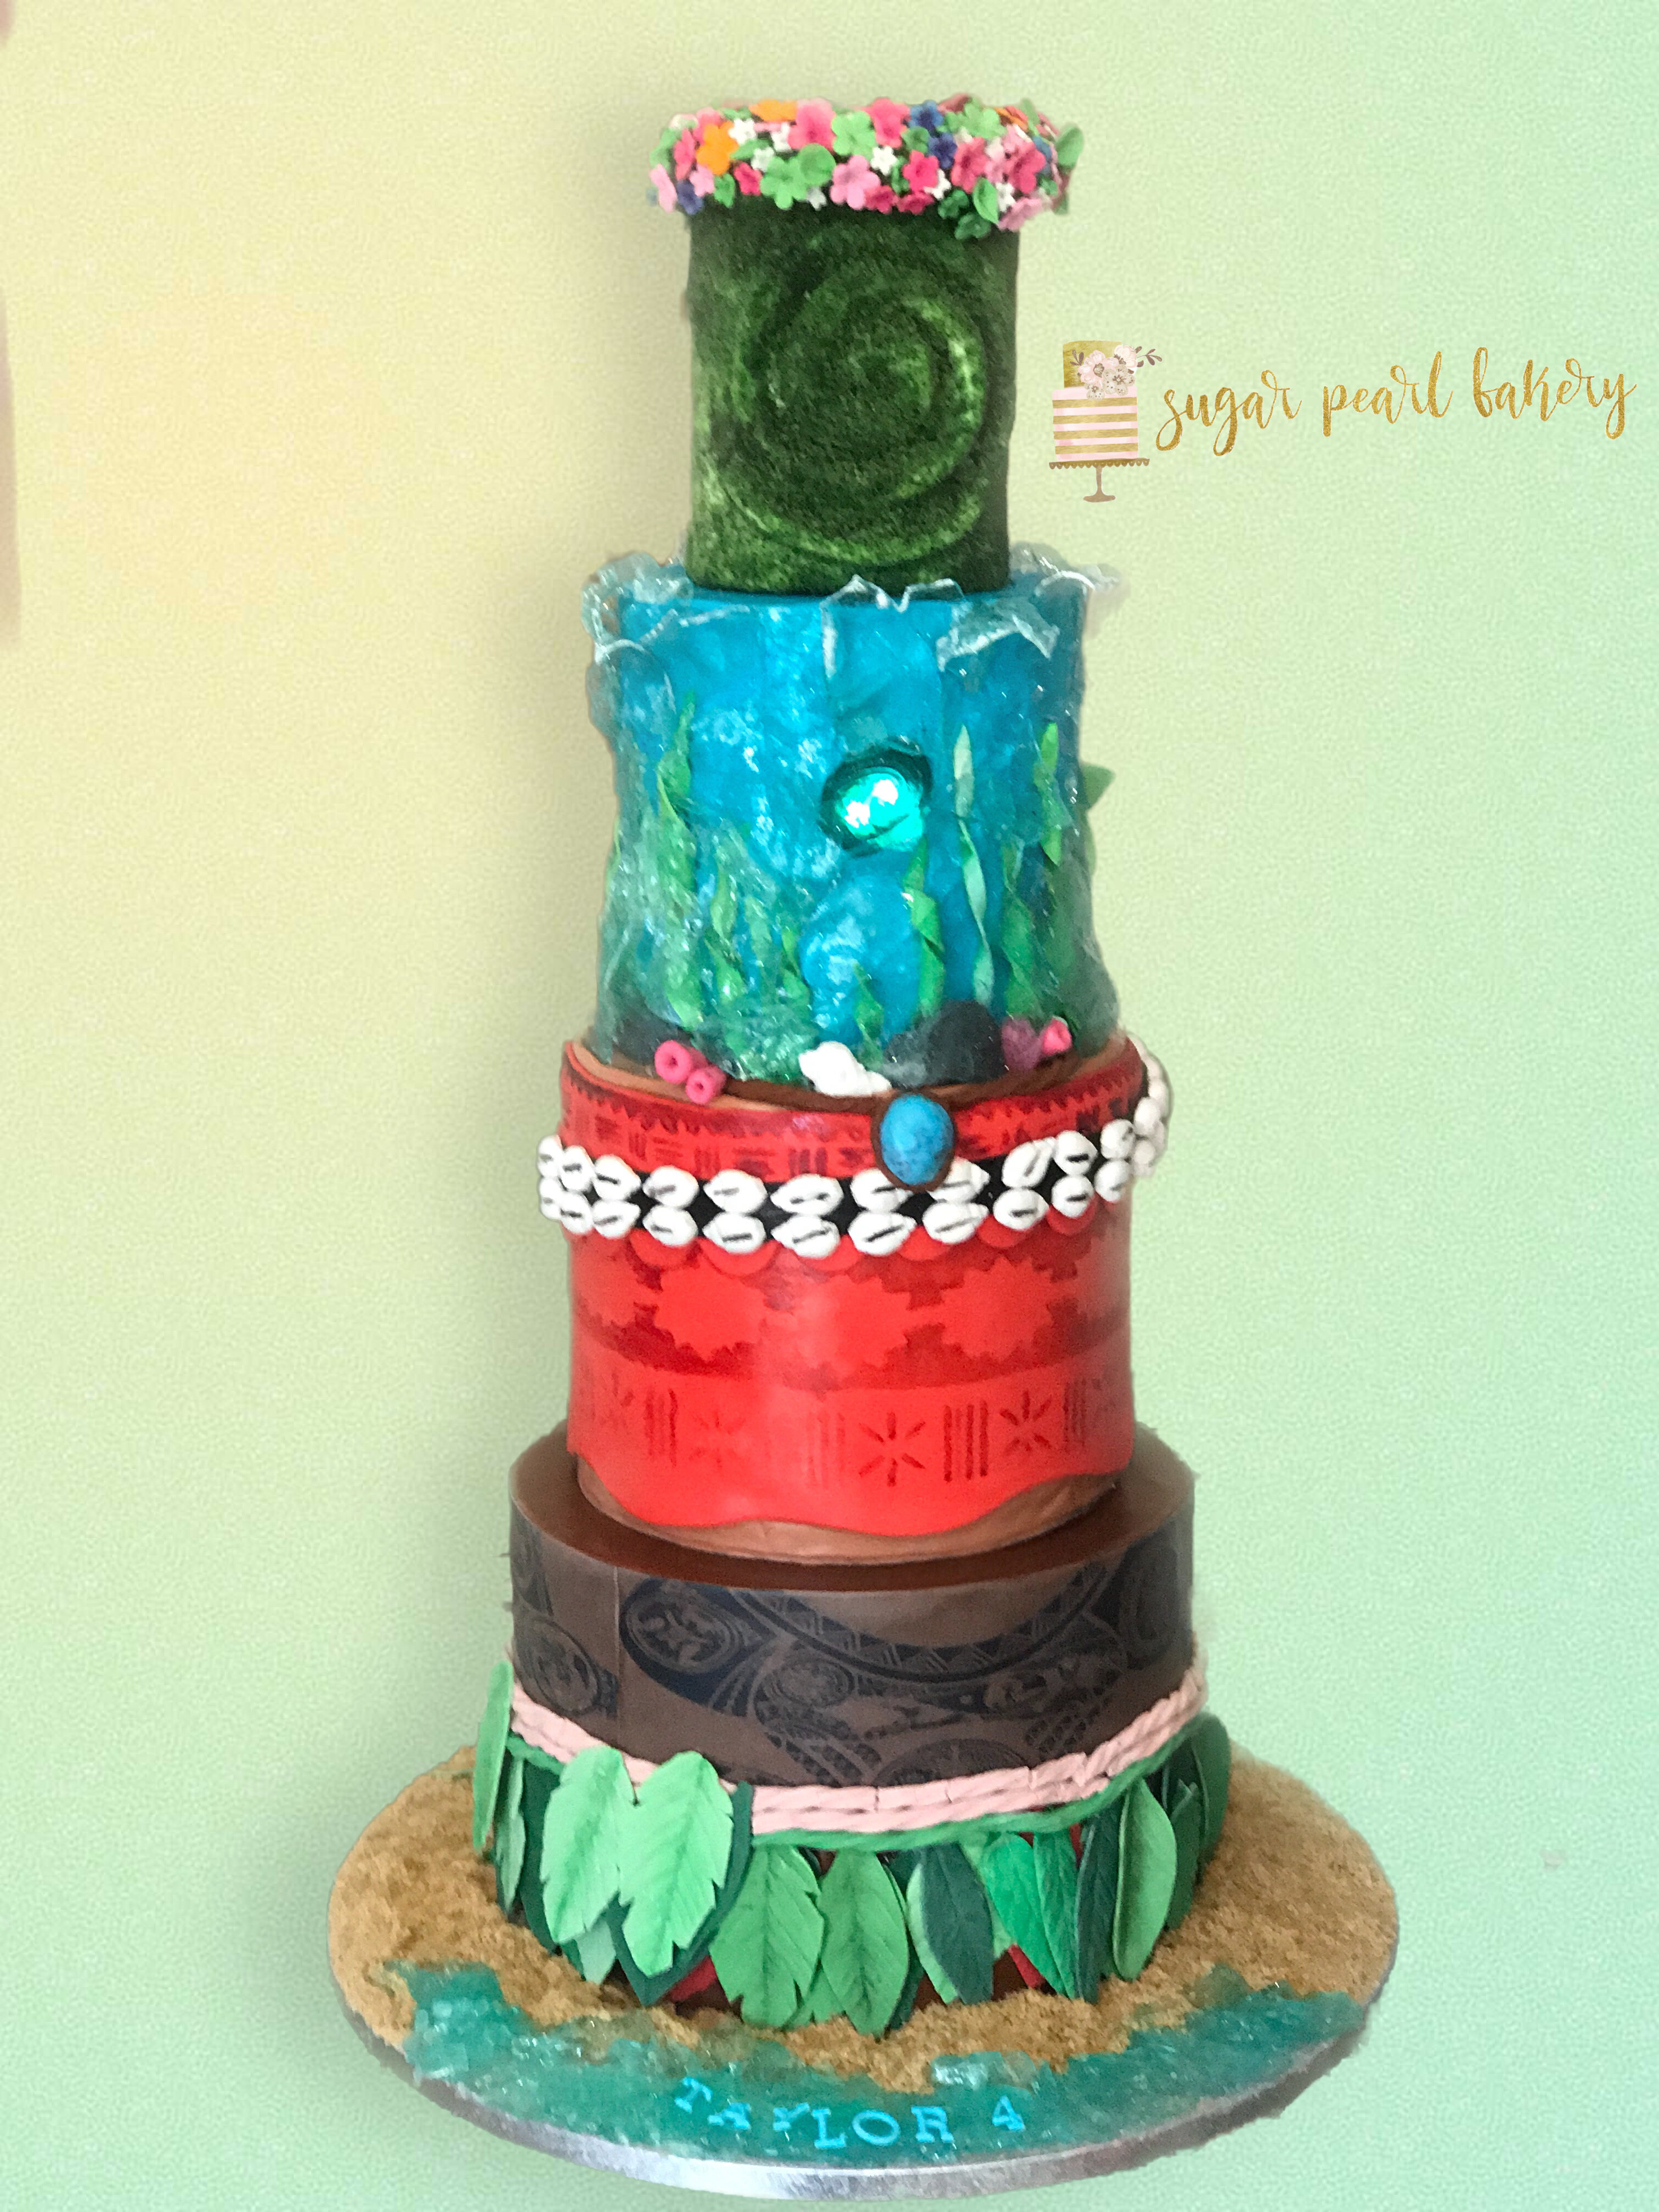 Moana birthday cake , Maui cake, sugar glass, tattoos, glowing ...